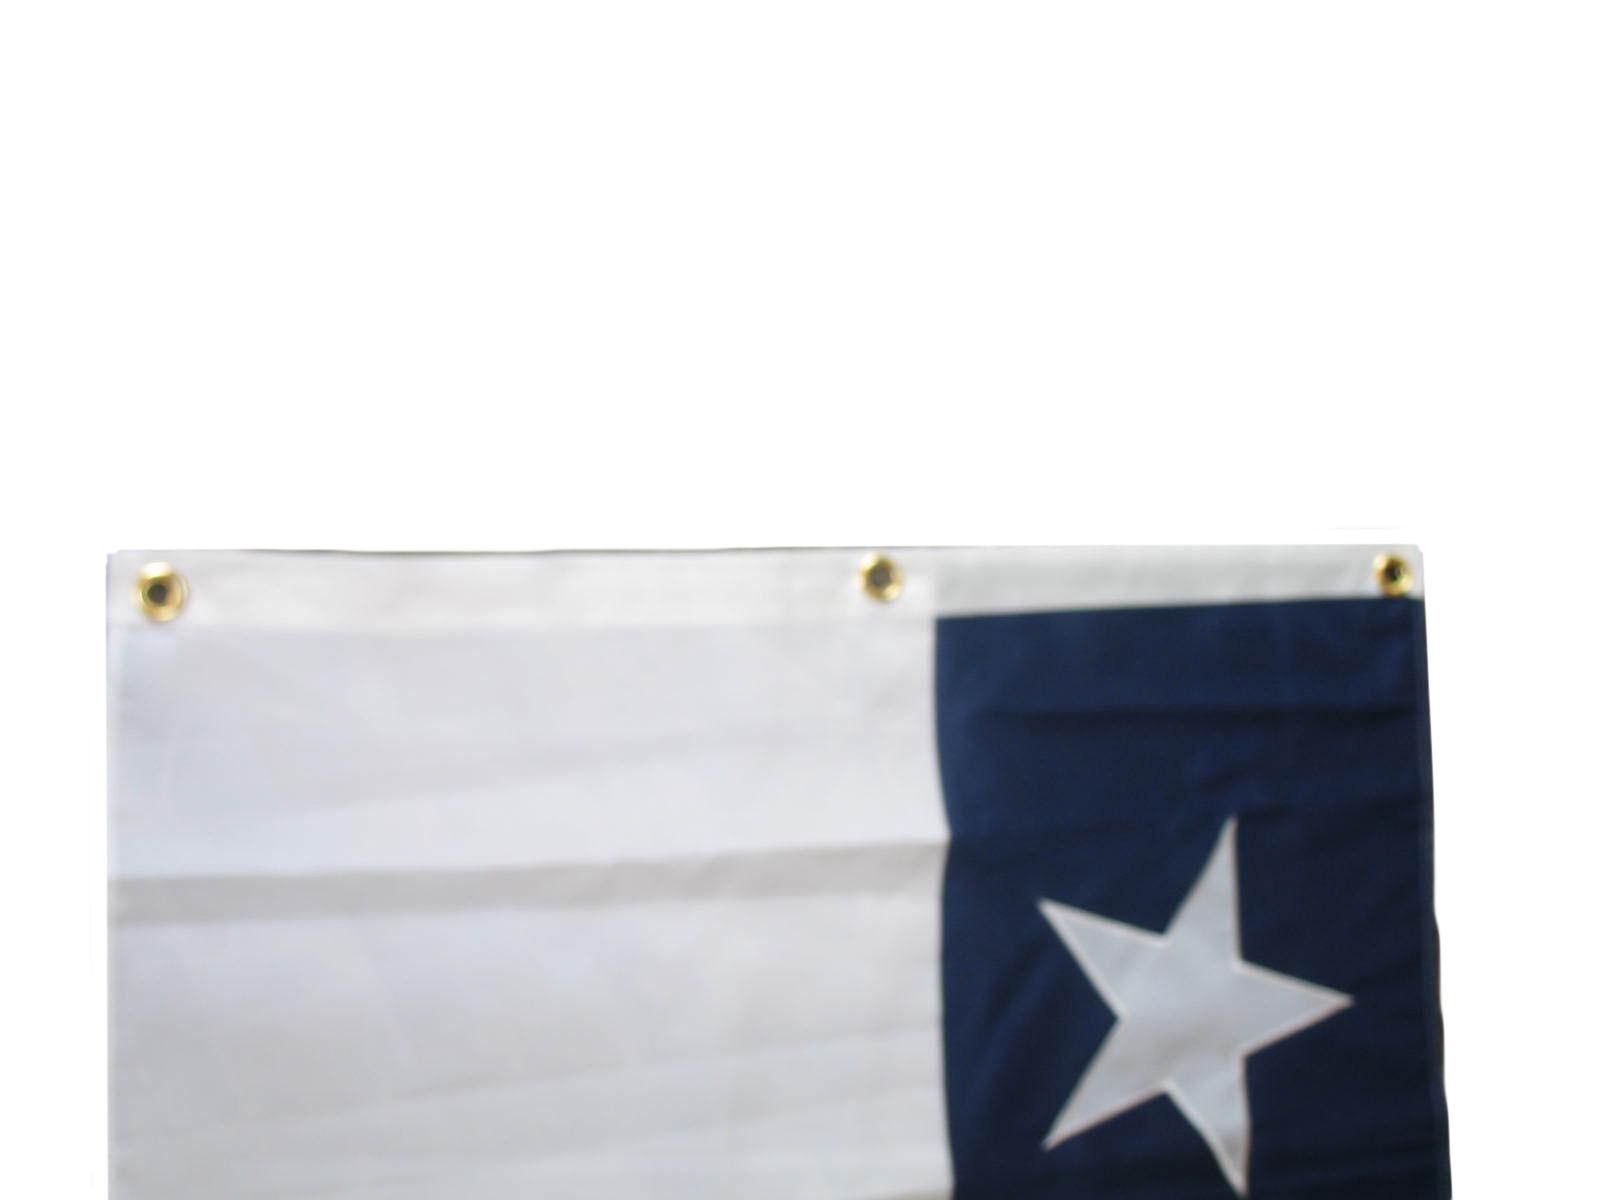 Puerto Rico Light Blue 10x15 Embroidered Sewn 600D Nylon Flag 10/'x15/' Heavy Duty